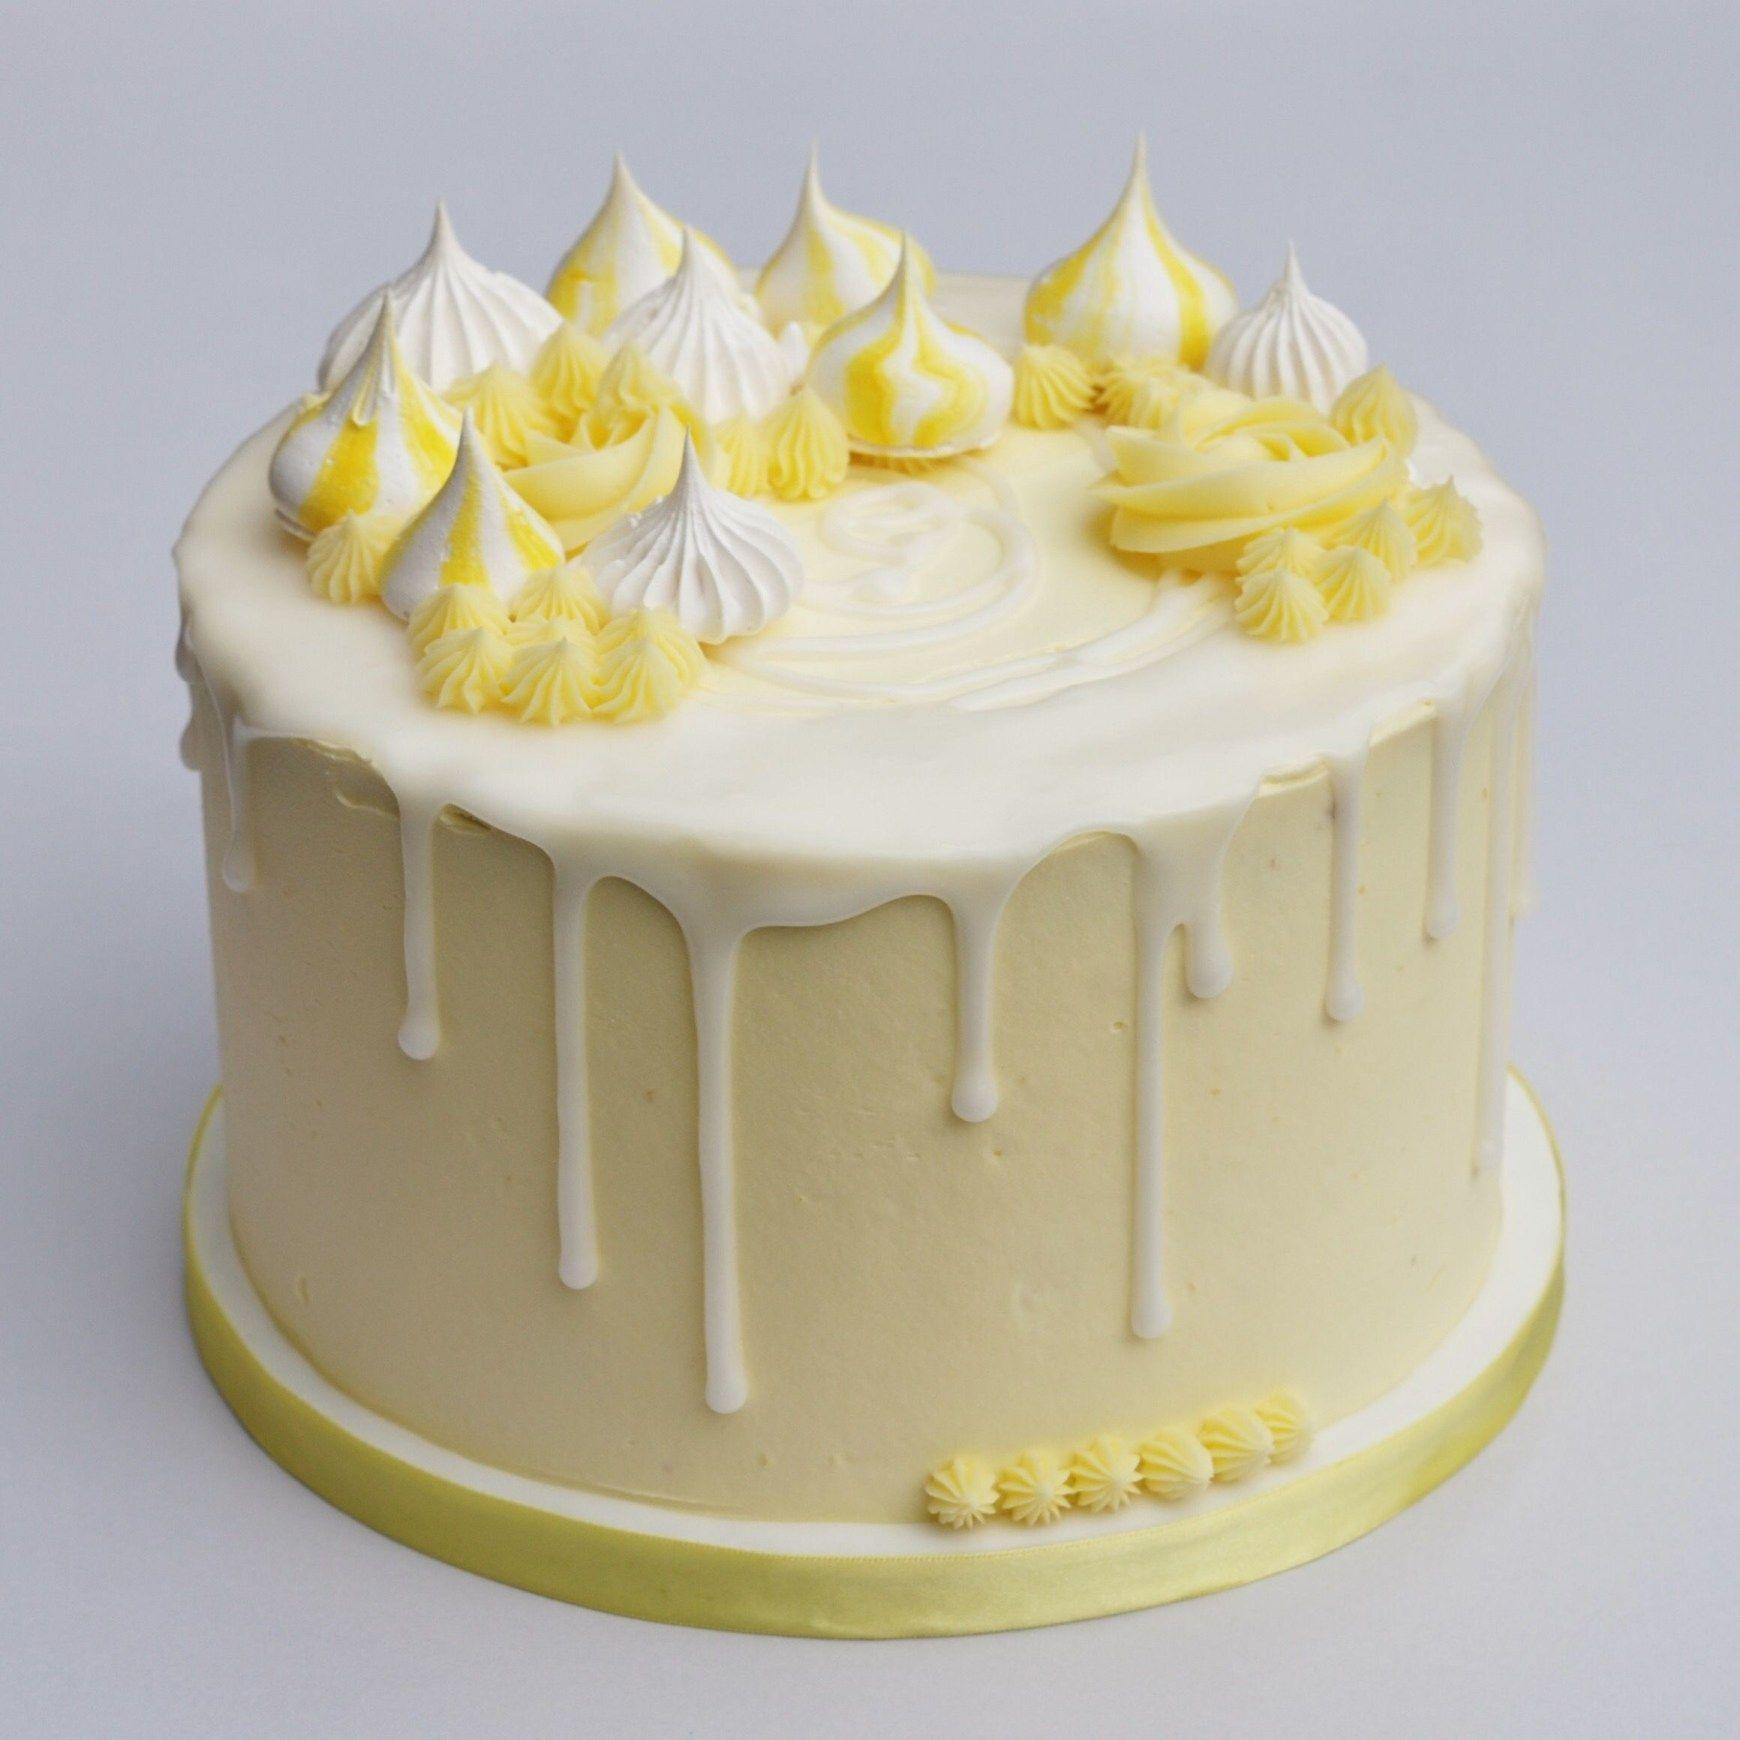 Tremendous 32 Amazing Picture Of Lemon Birthday Cake Lemon Birthday Cakes Personalised Birthday Cards Paralily Jamesorg